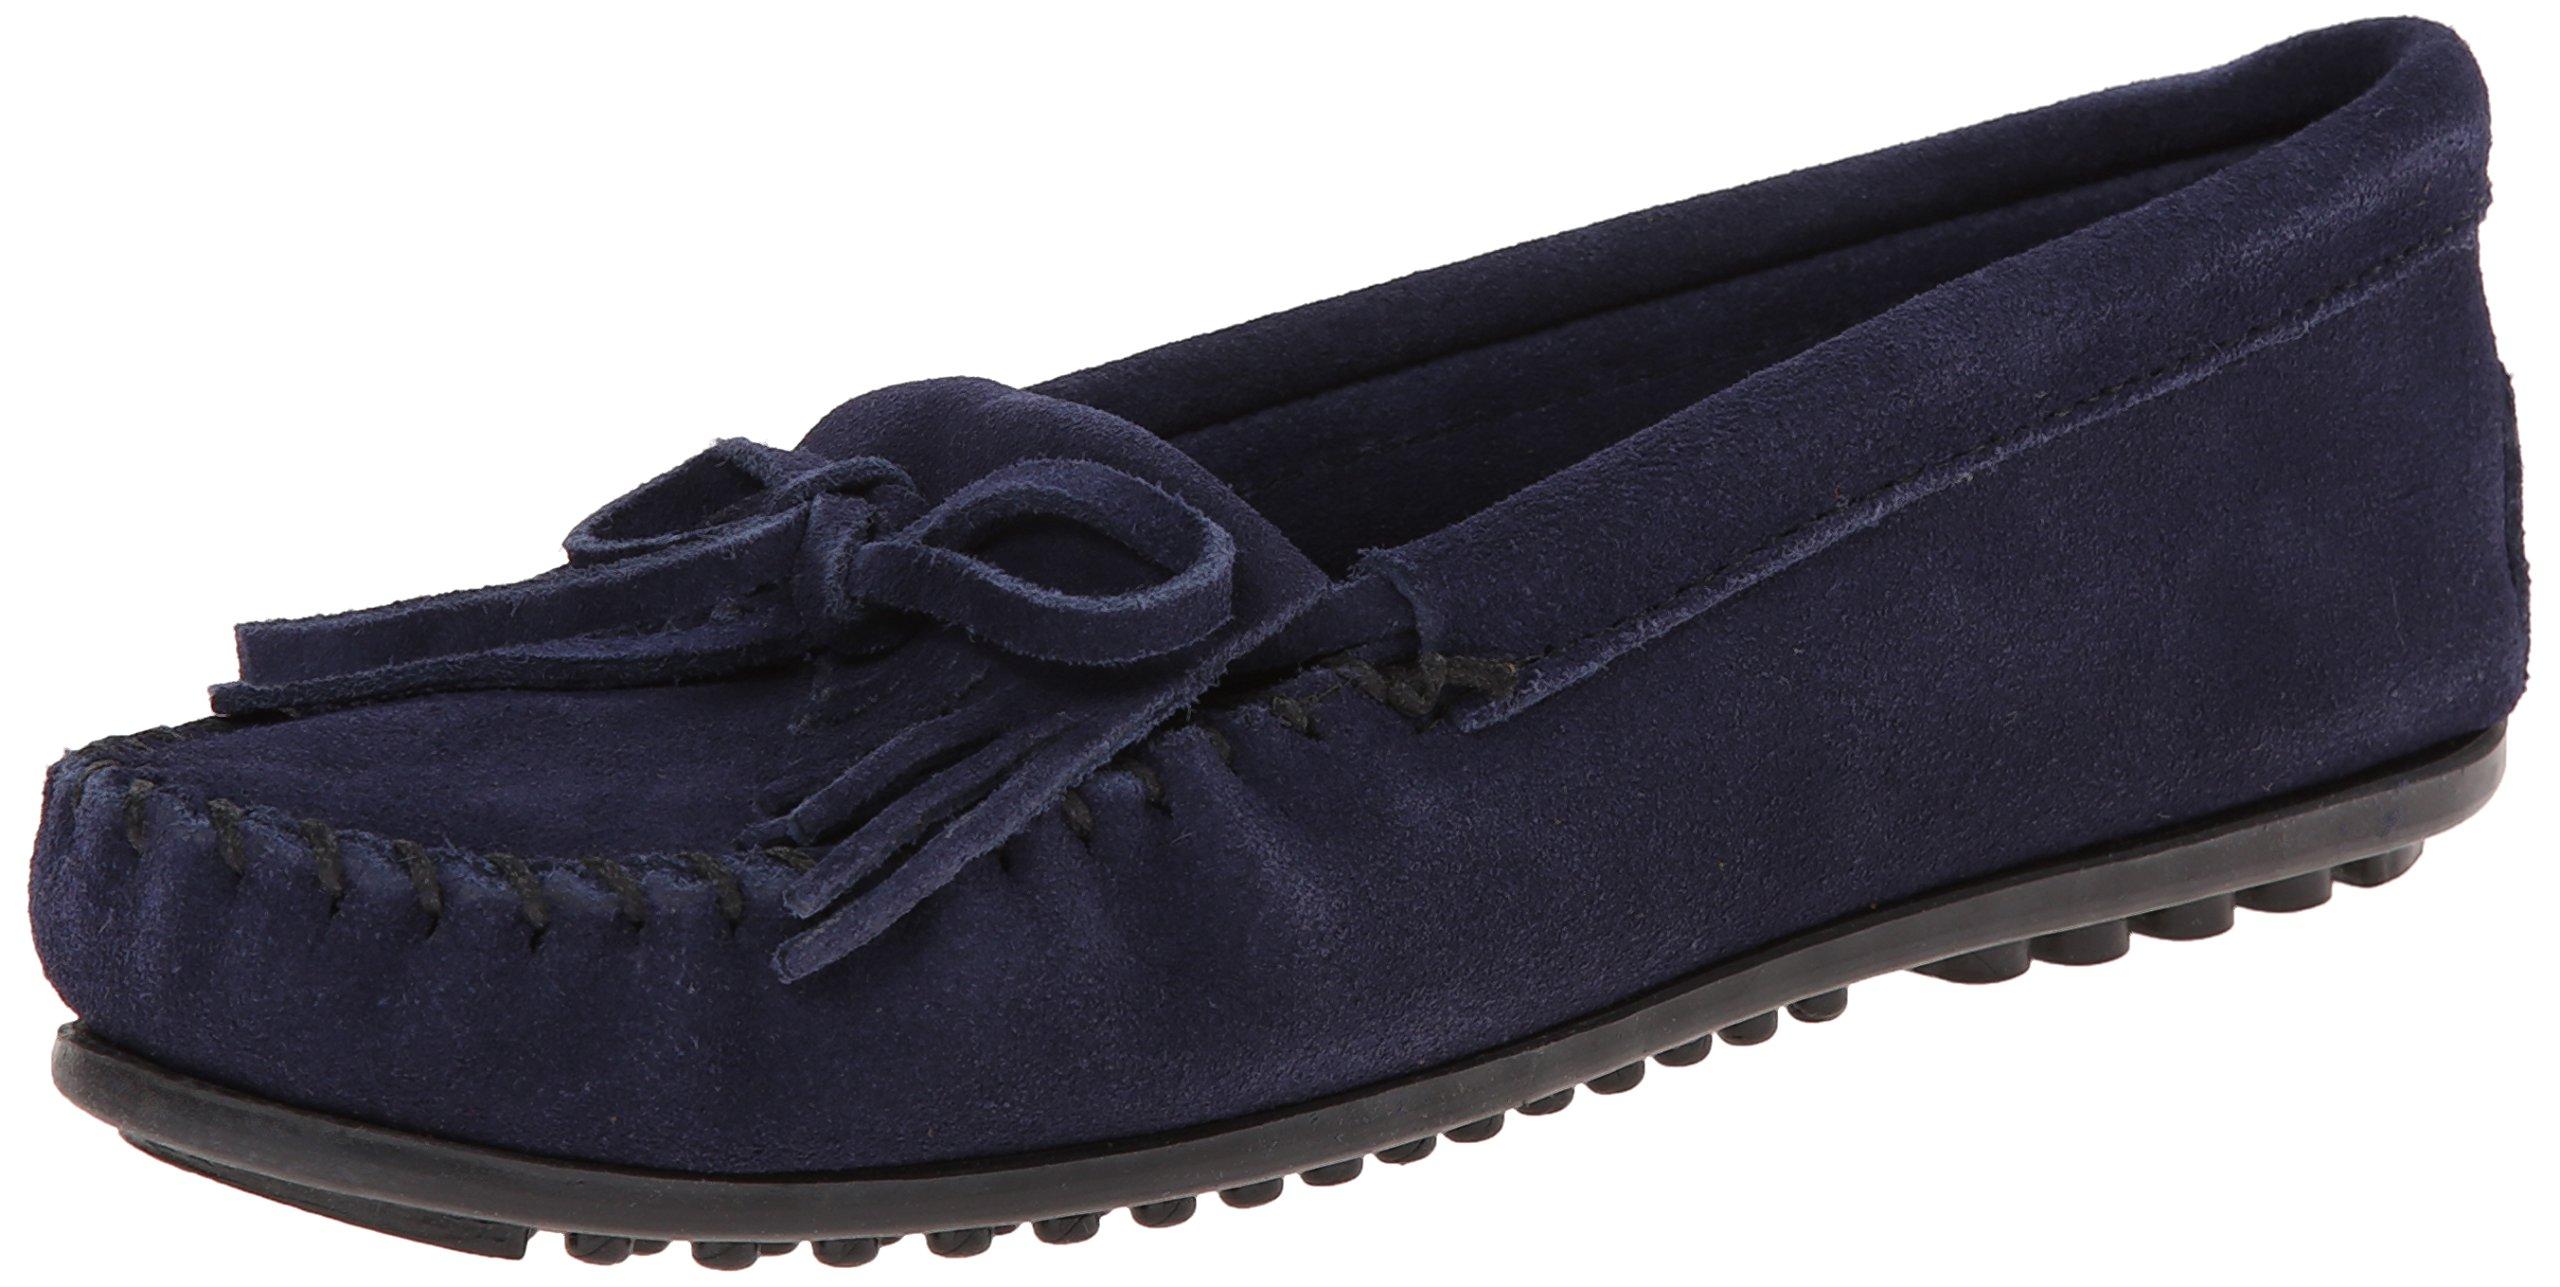 Minnetonka Shoes Womens Kilty Hardsole Moccasin 7.5 Navy 409T